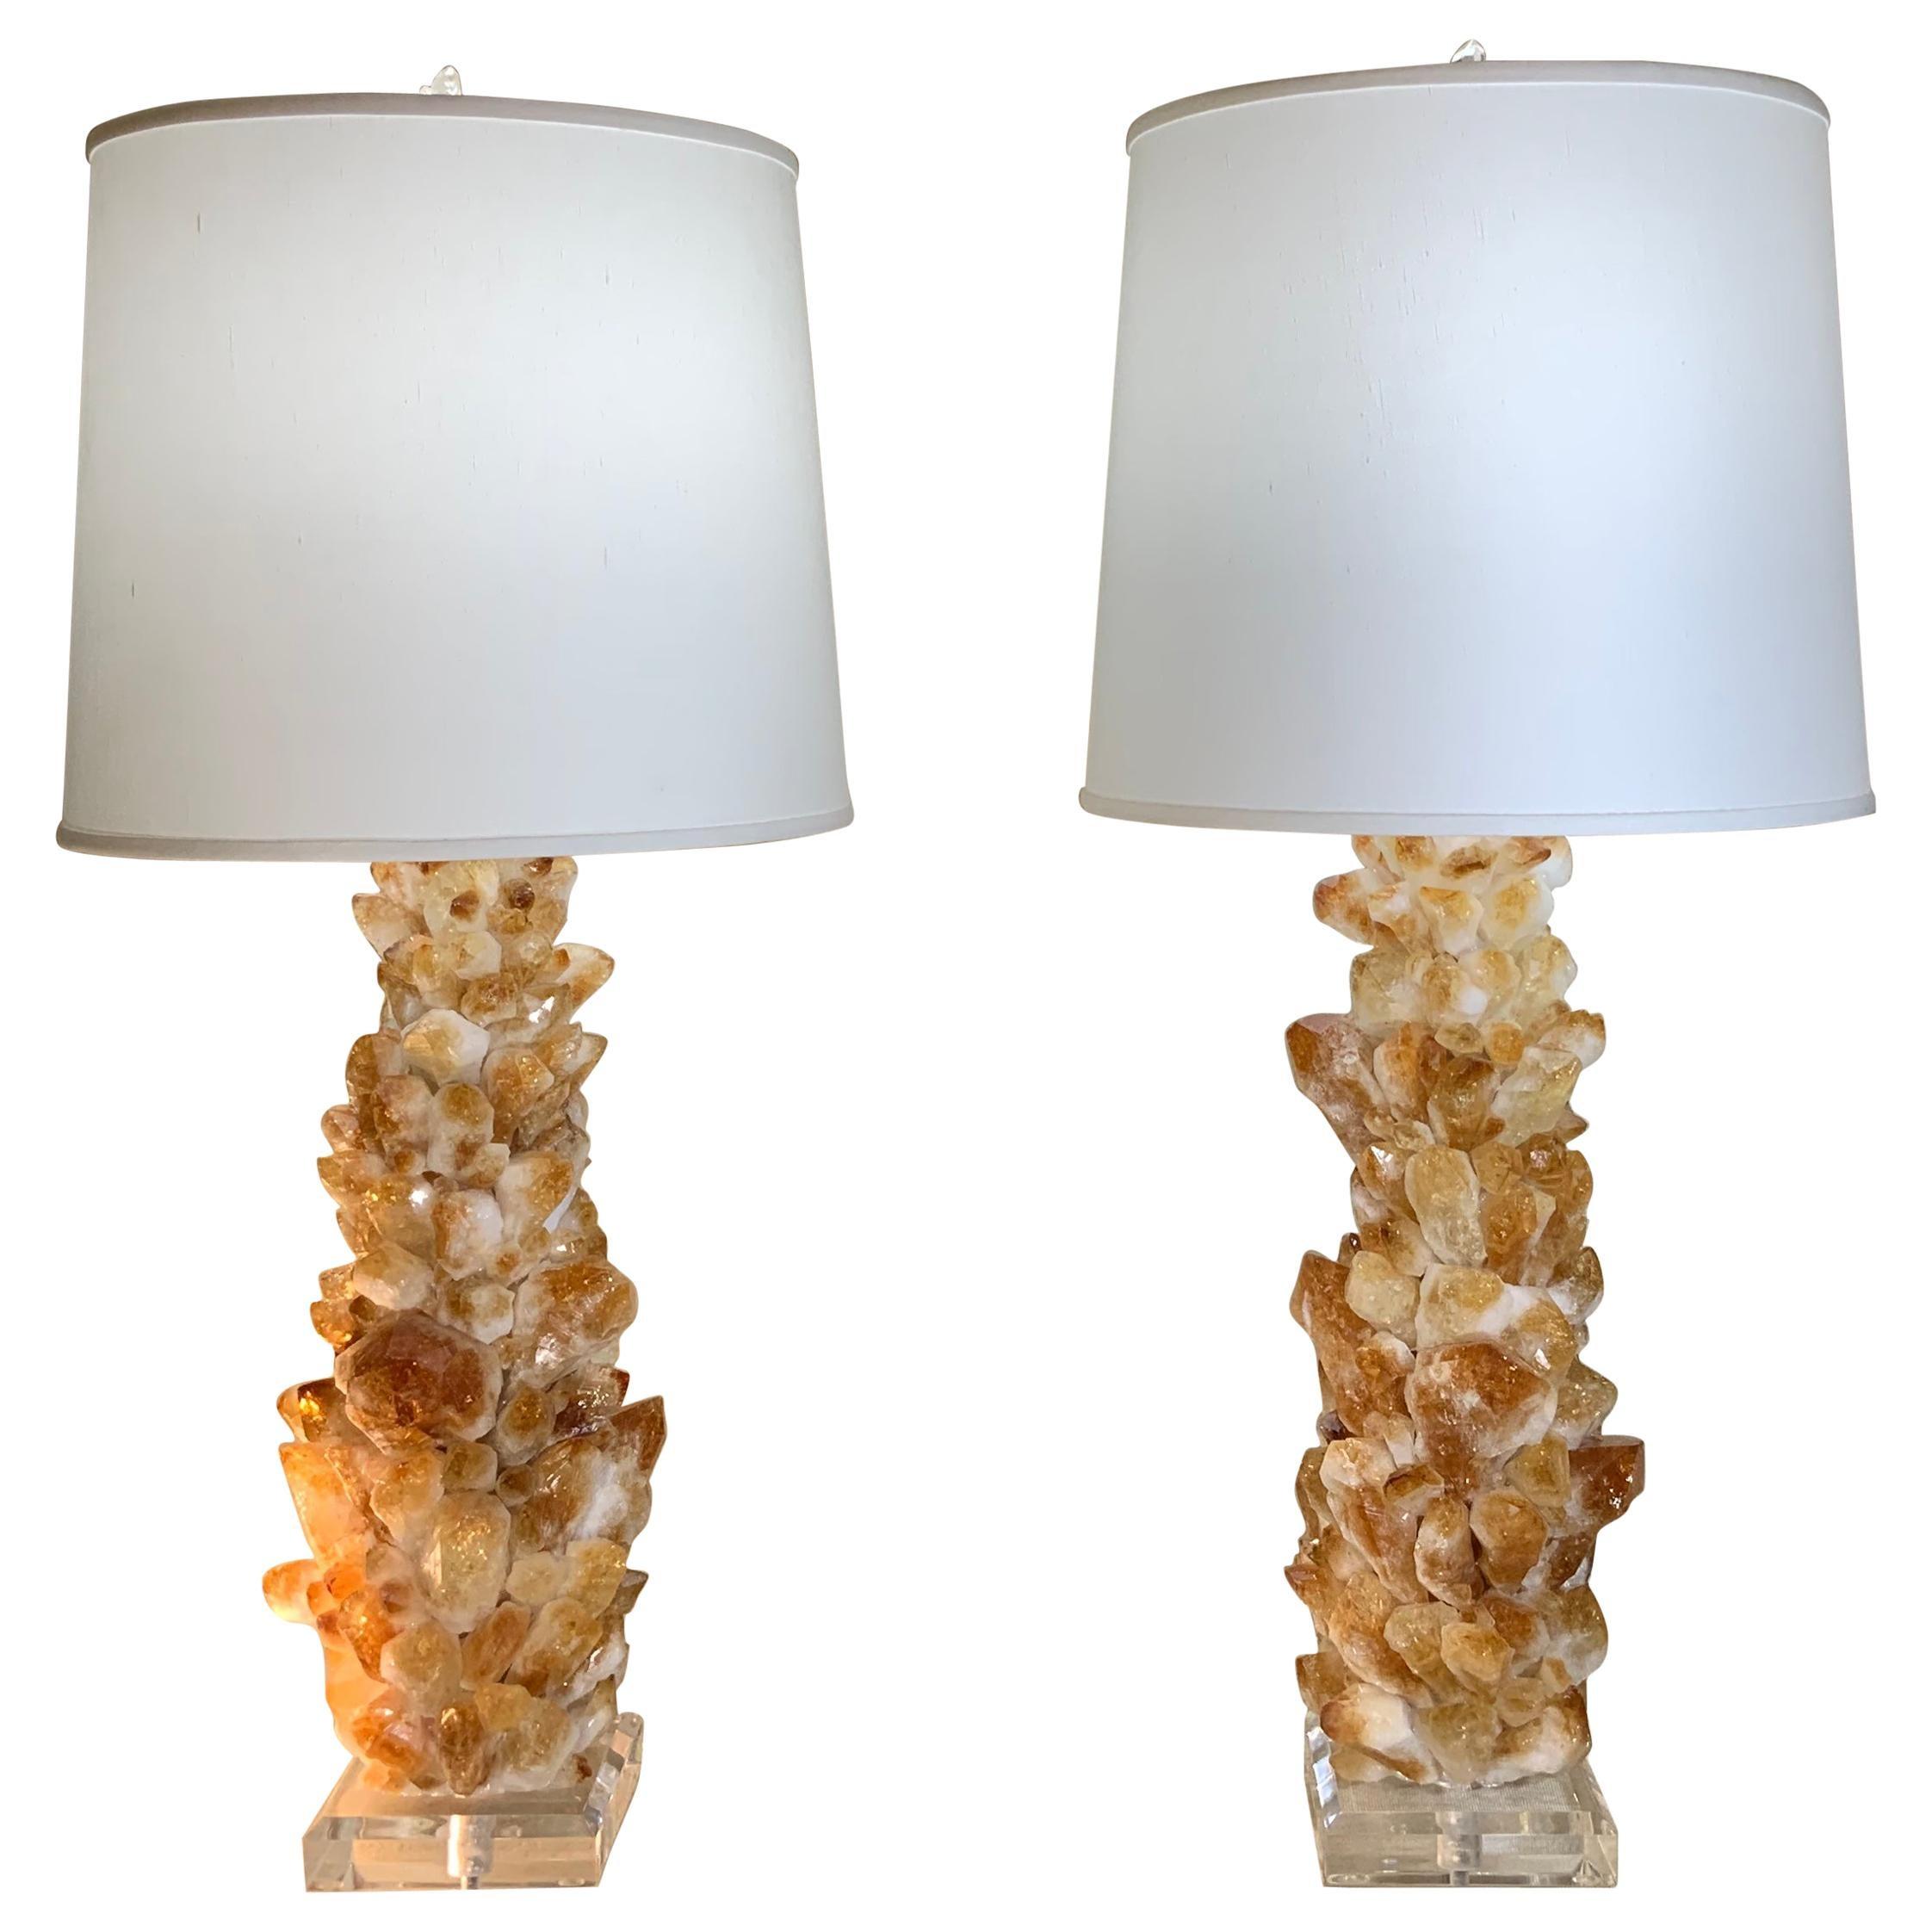 Pair of Rock Quartz Citrine Crystal Table Lamps by Joseph Malekan